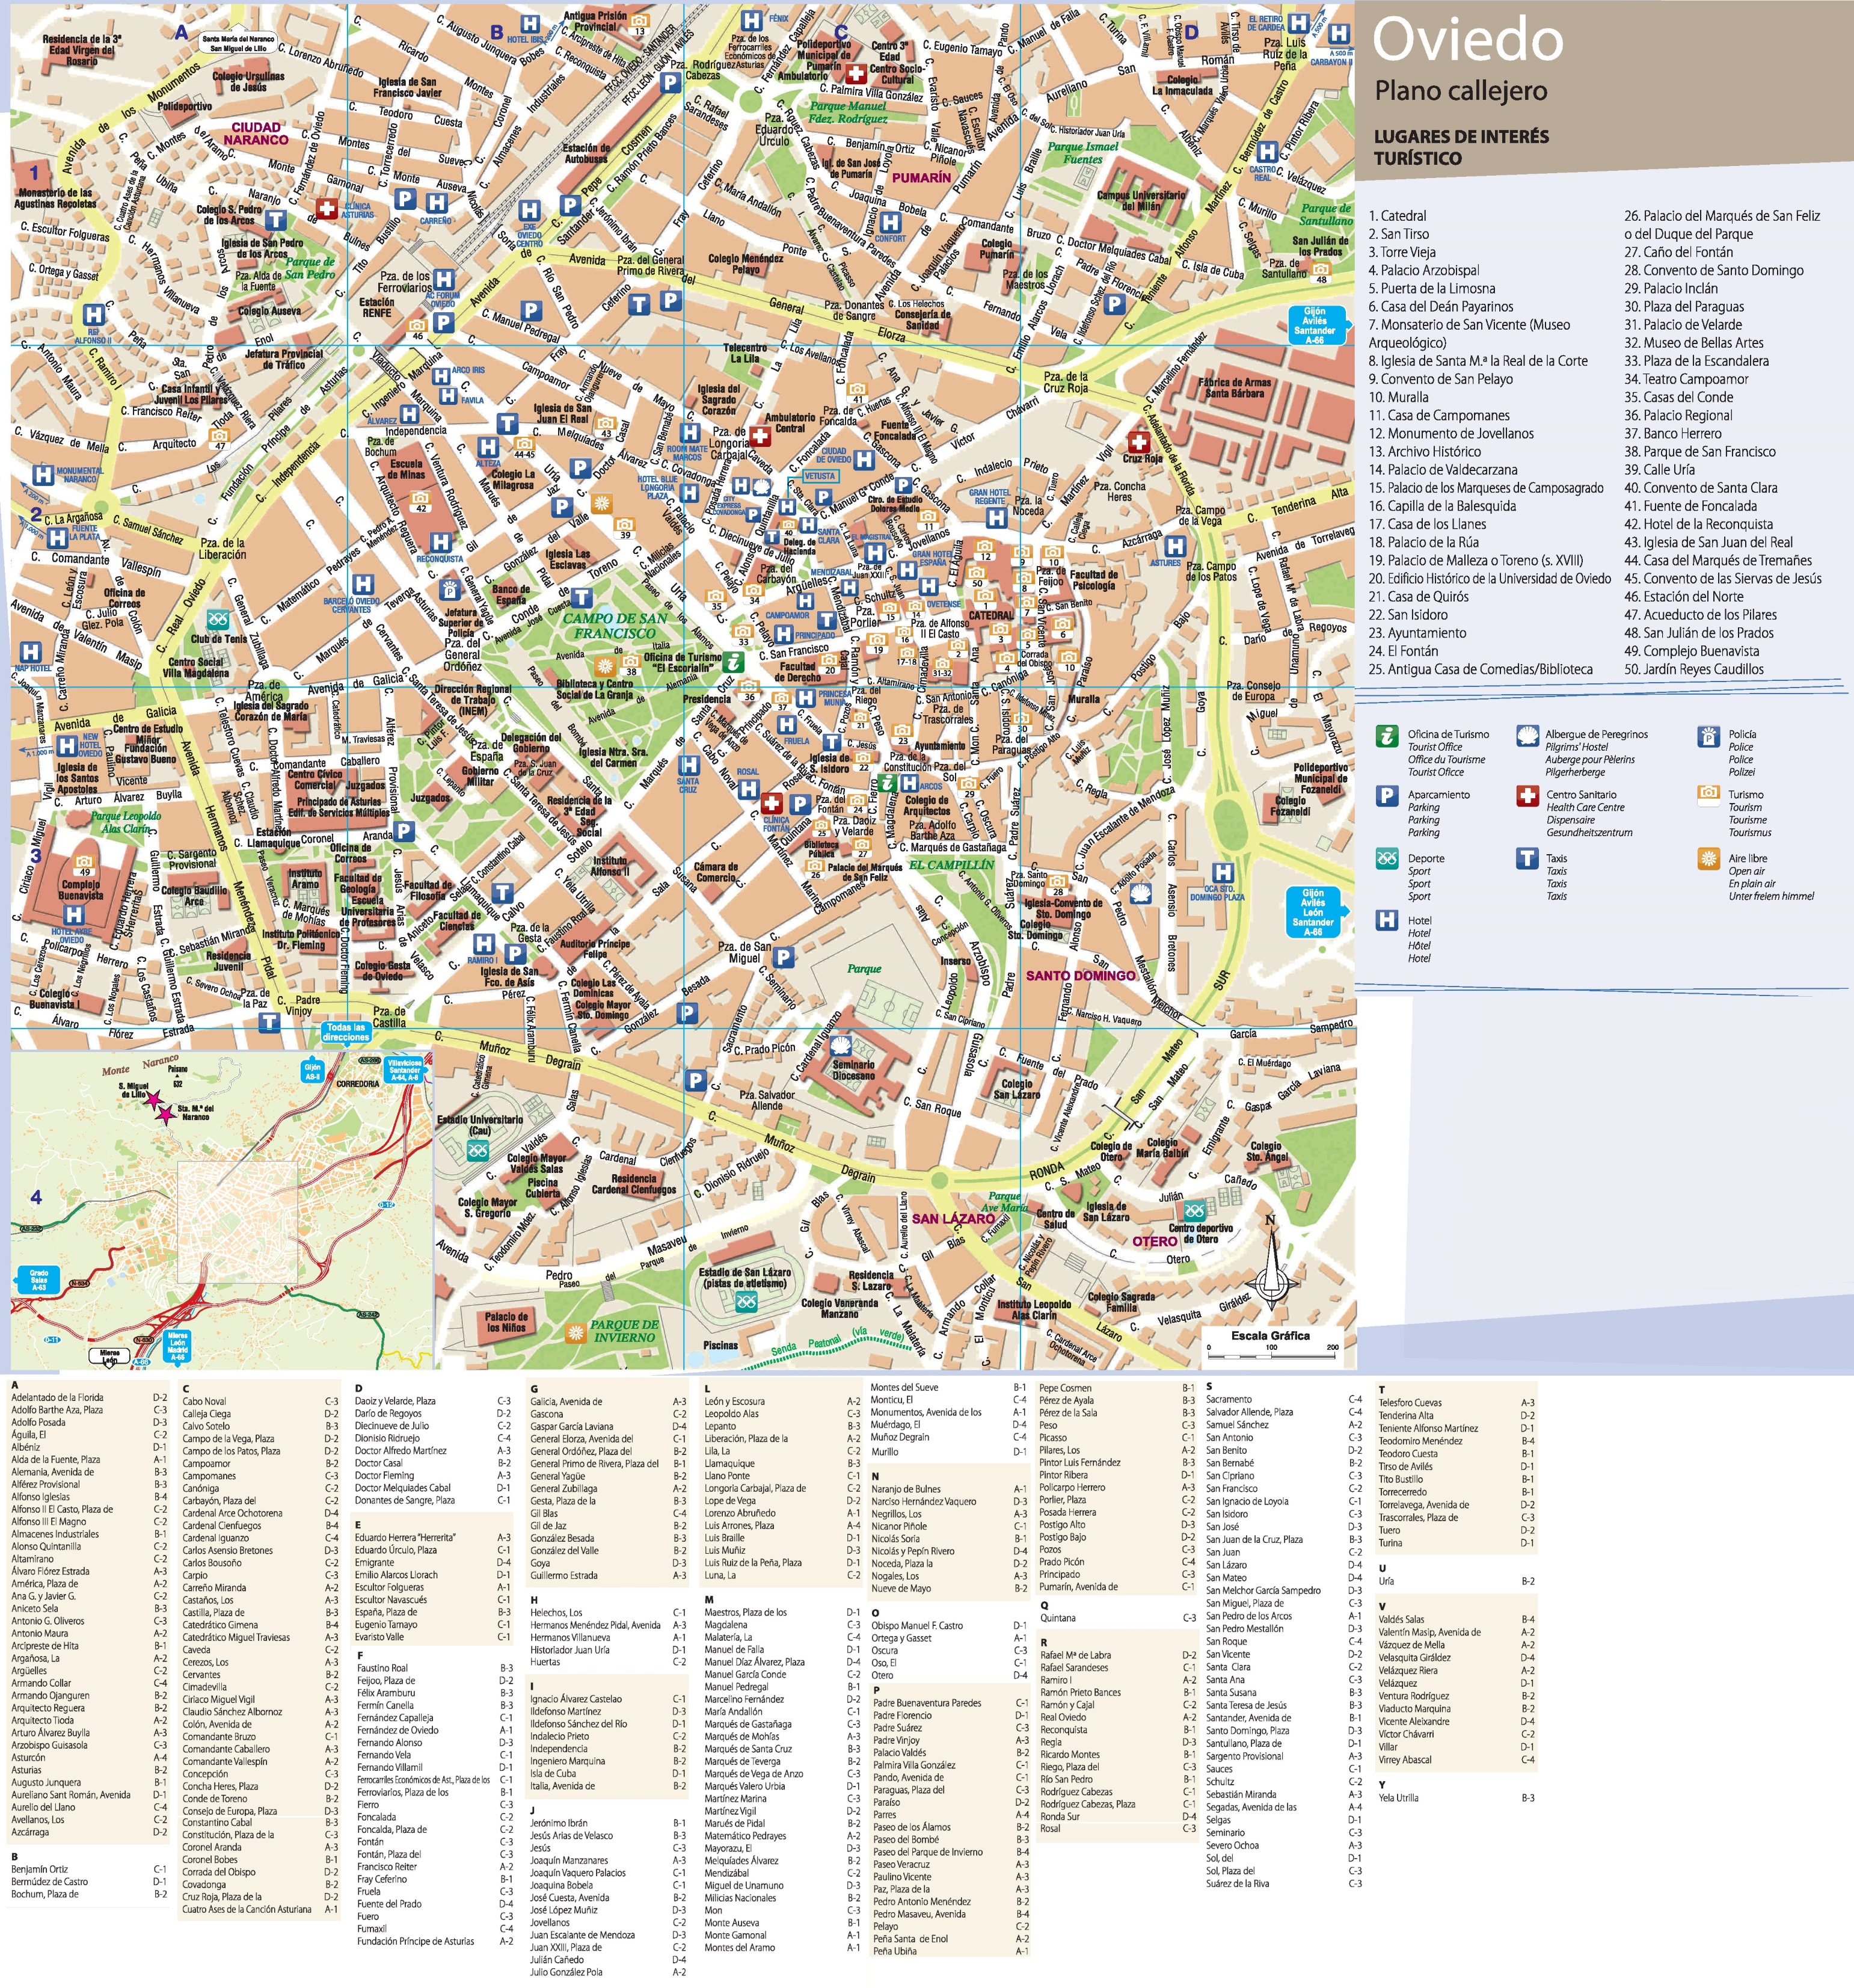 Oviedo tourist map